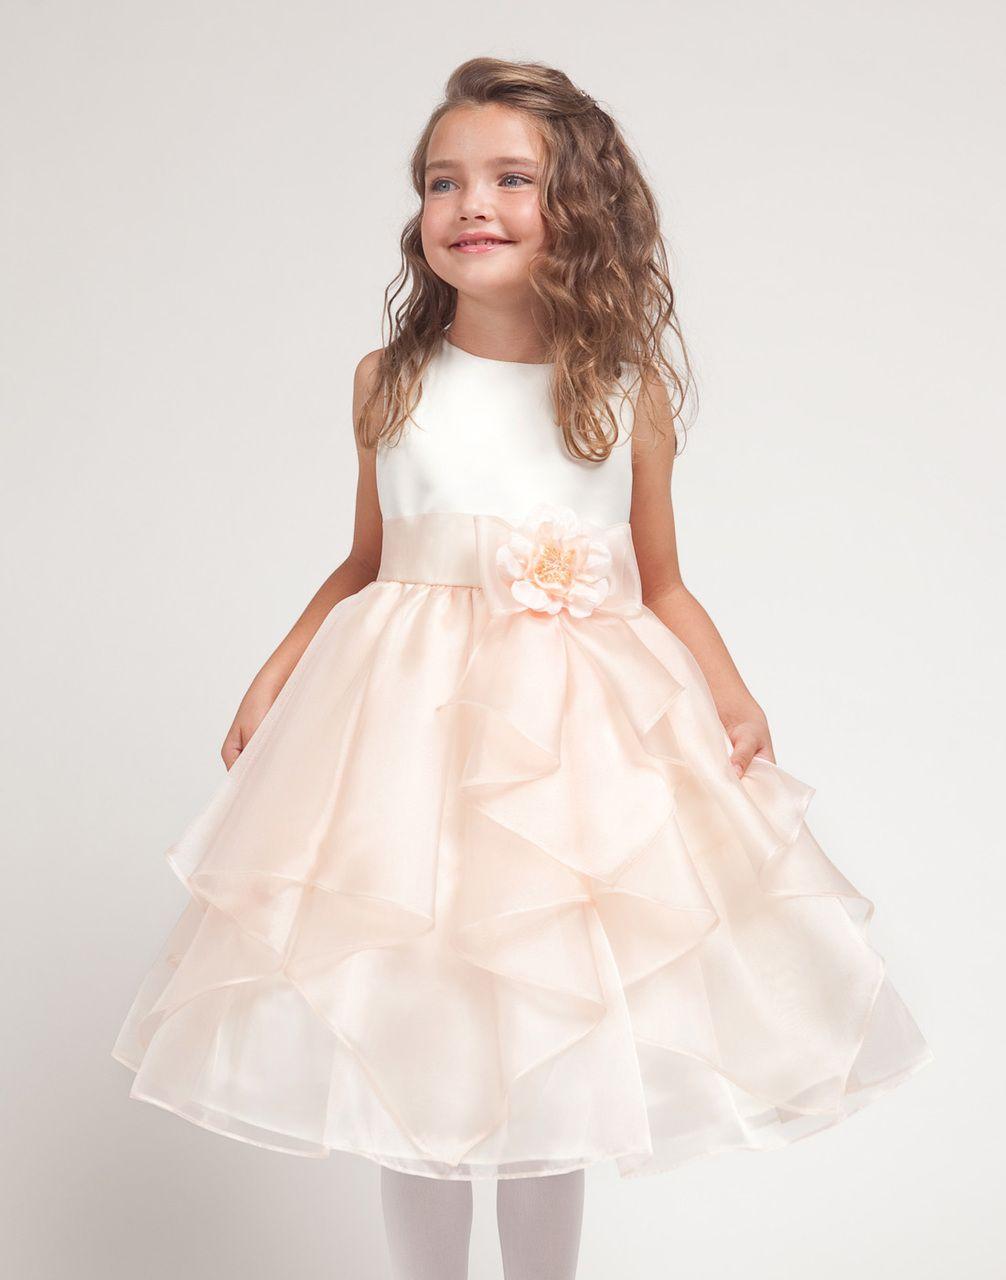 Smooth Satin and Mirror Organza Handkerchief Style Dress  DressCouture